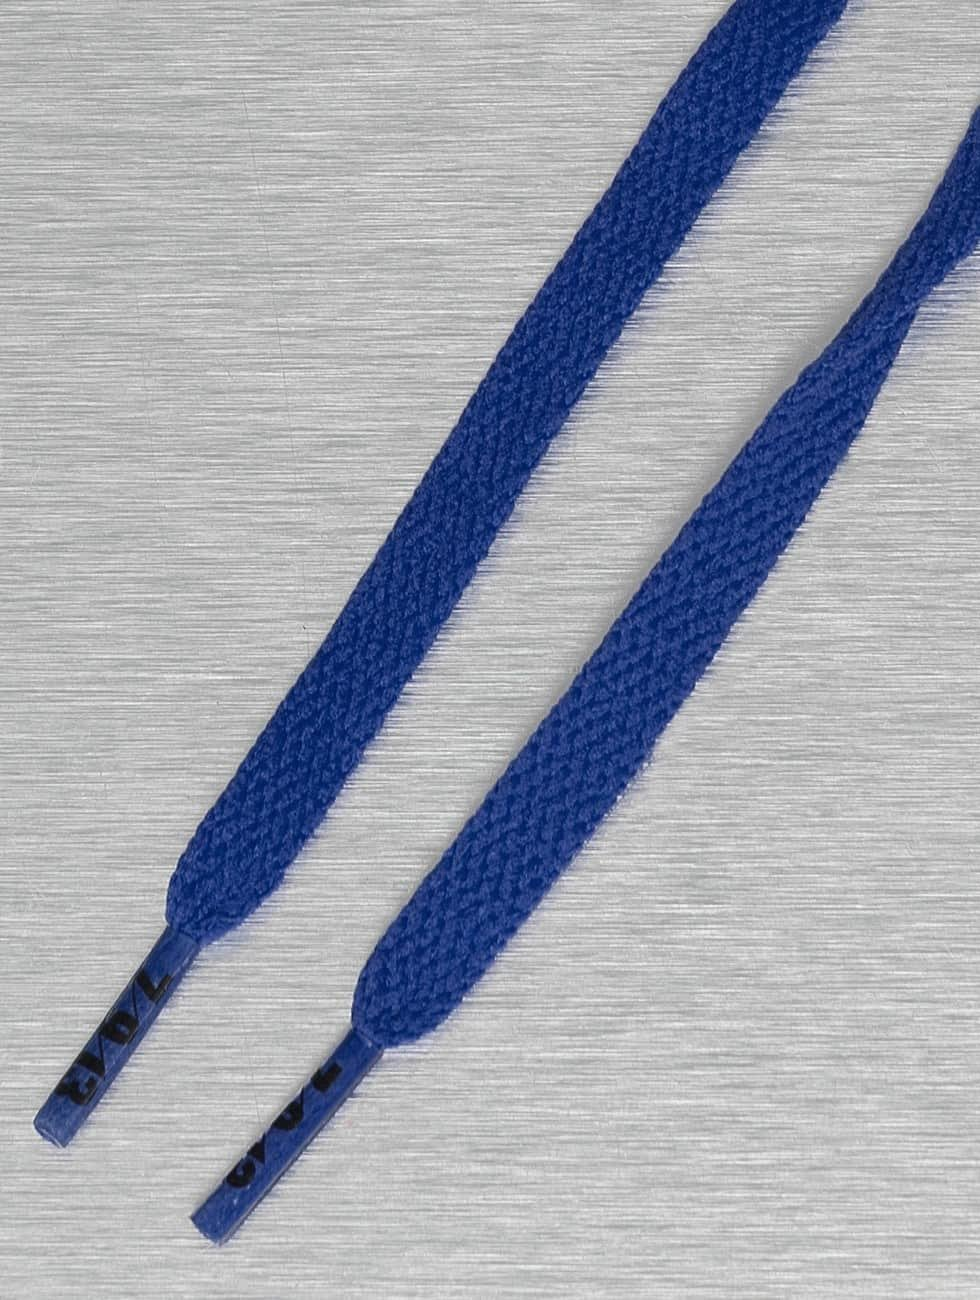 Seven Nine 13 Schoenveter Hard Candy Short blauw